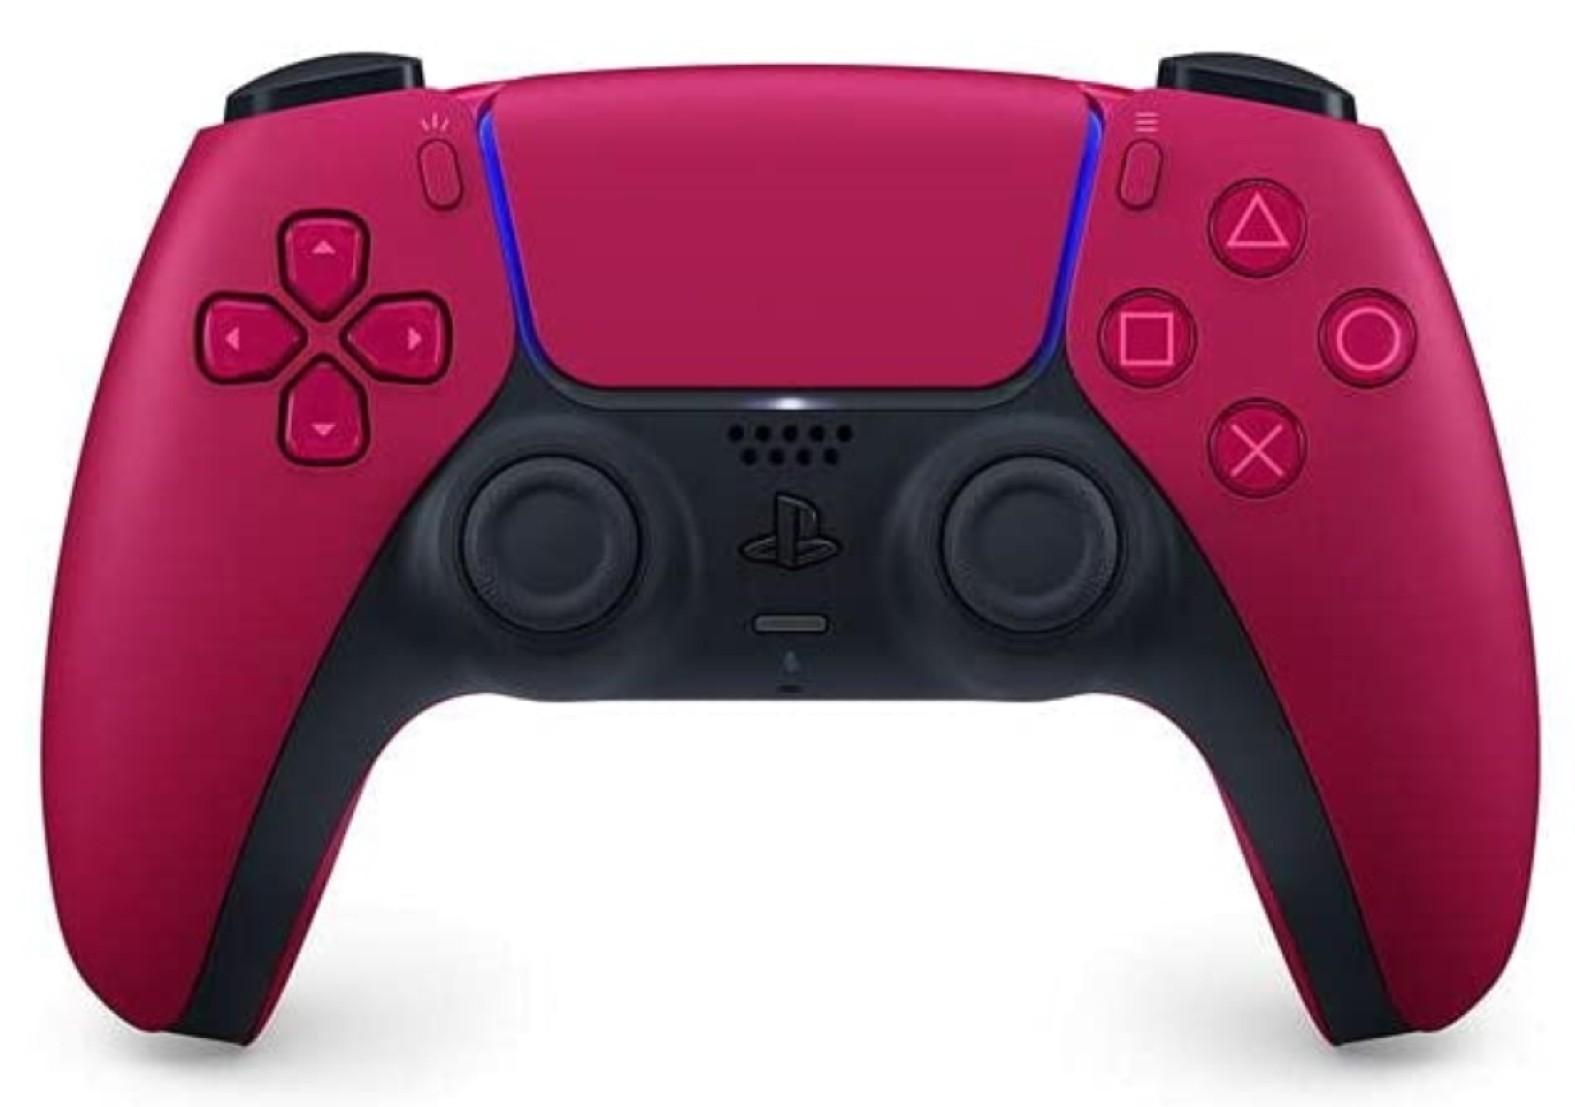 Бездротовий контролер/джойстик/геймпад DualSense для PlayStation 5 | DualSense Cosmic Red Wireless Controller PS5